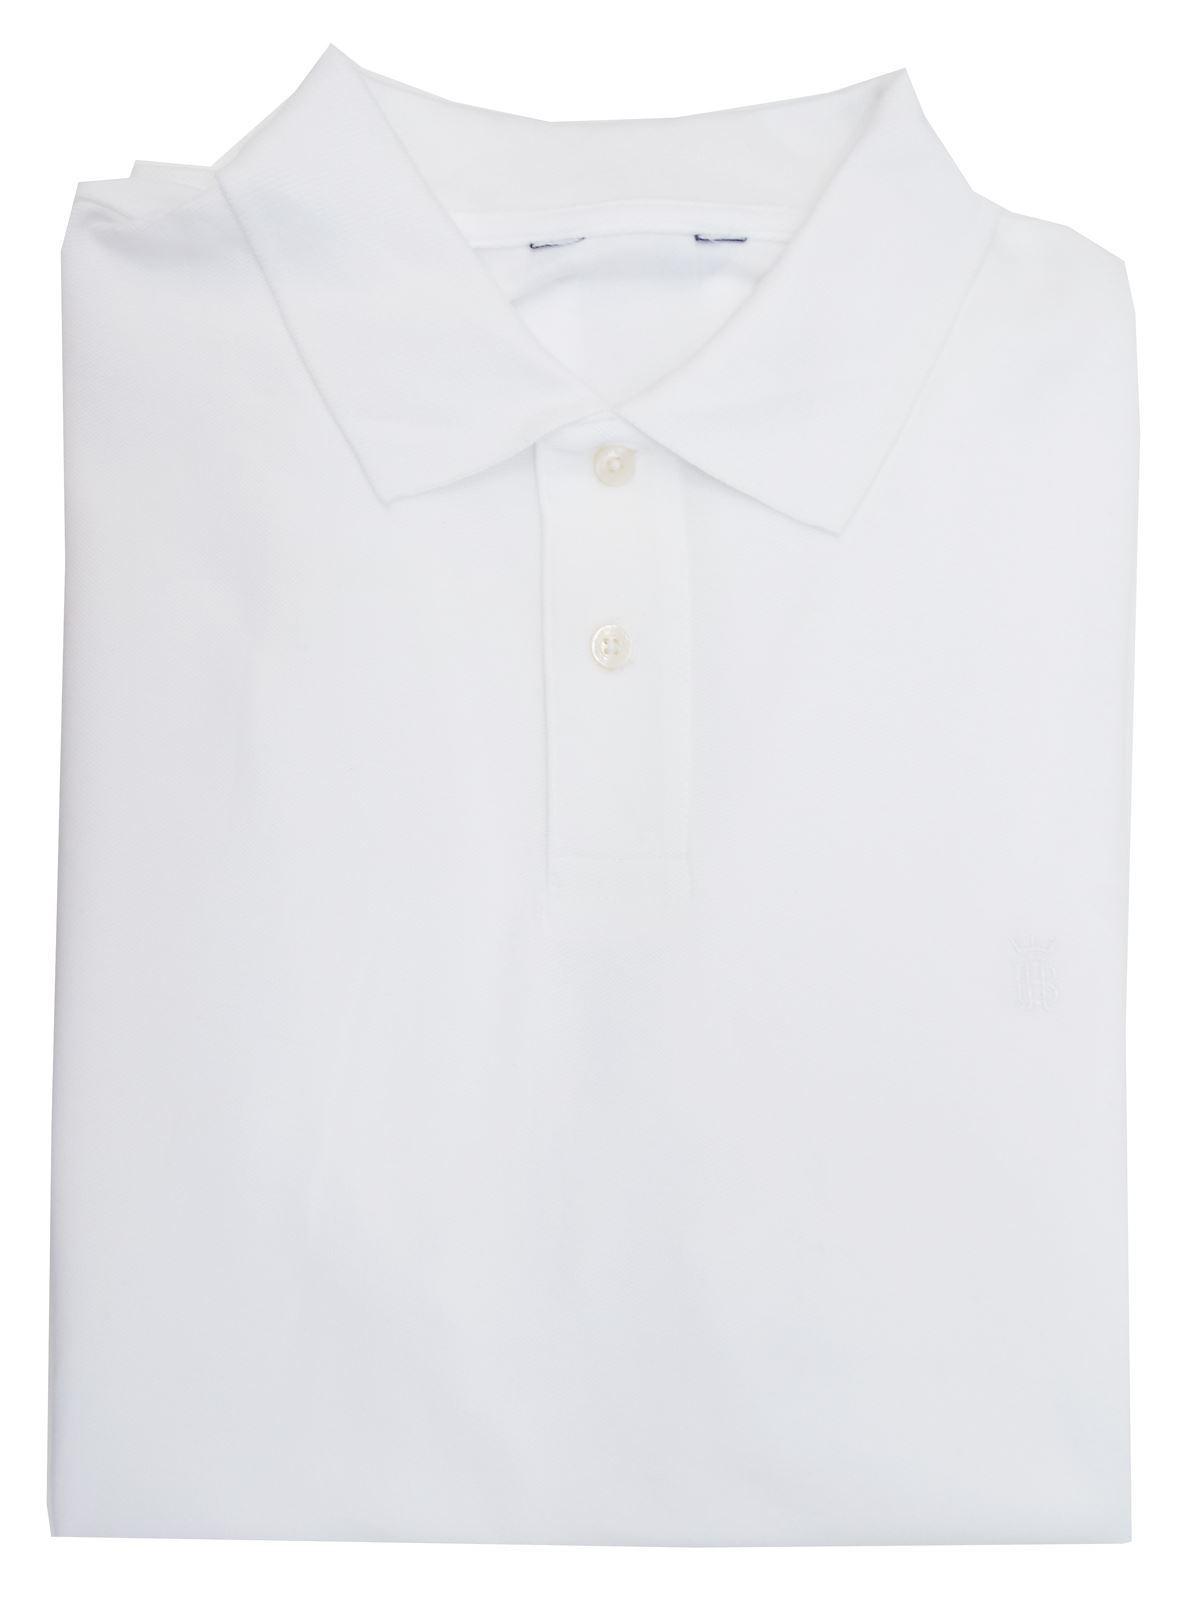 Ex-M-amp-S-Mens-Cotton-Polo-Shirt-Marks-amp-Spencer-Blue-Harbour-Size-S-M thumbnail 17